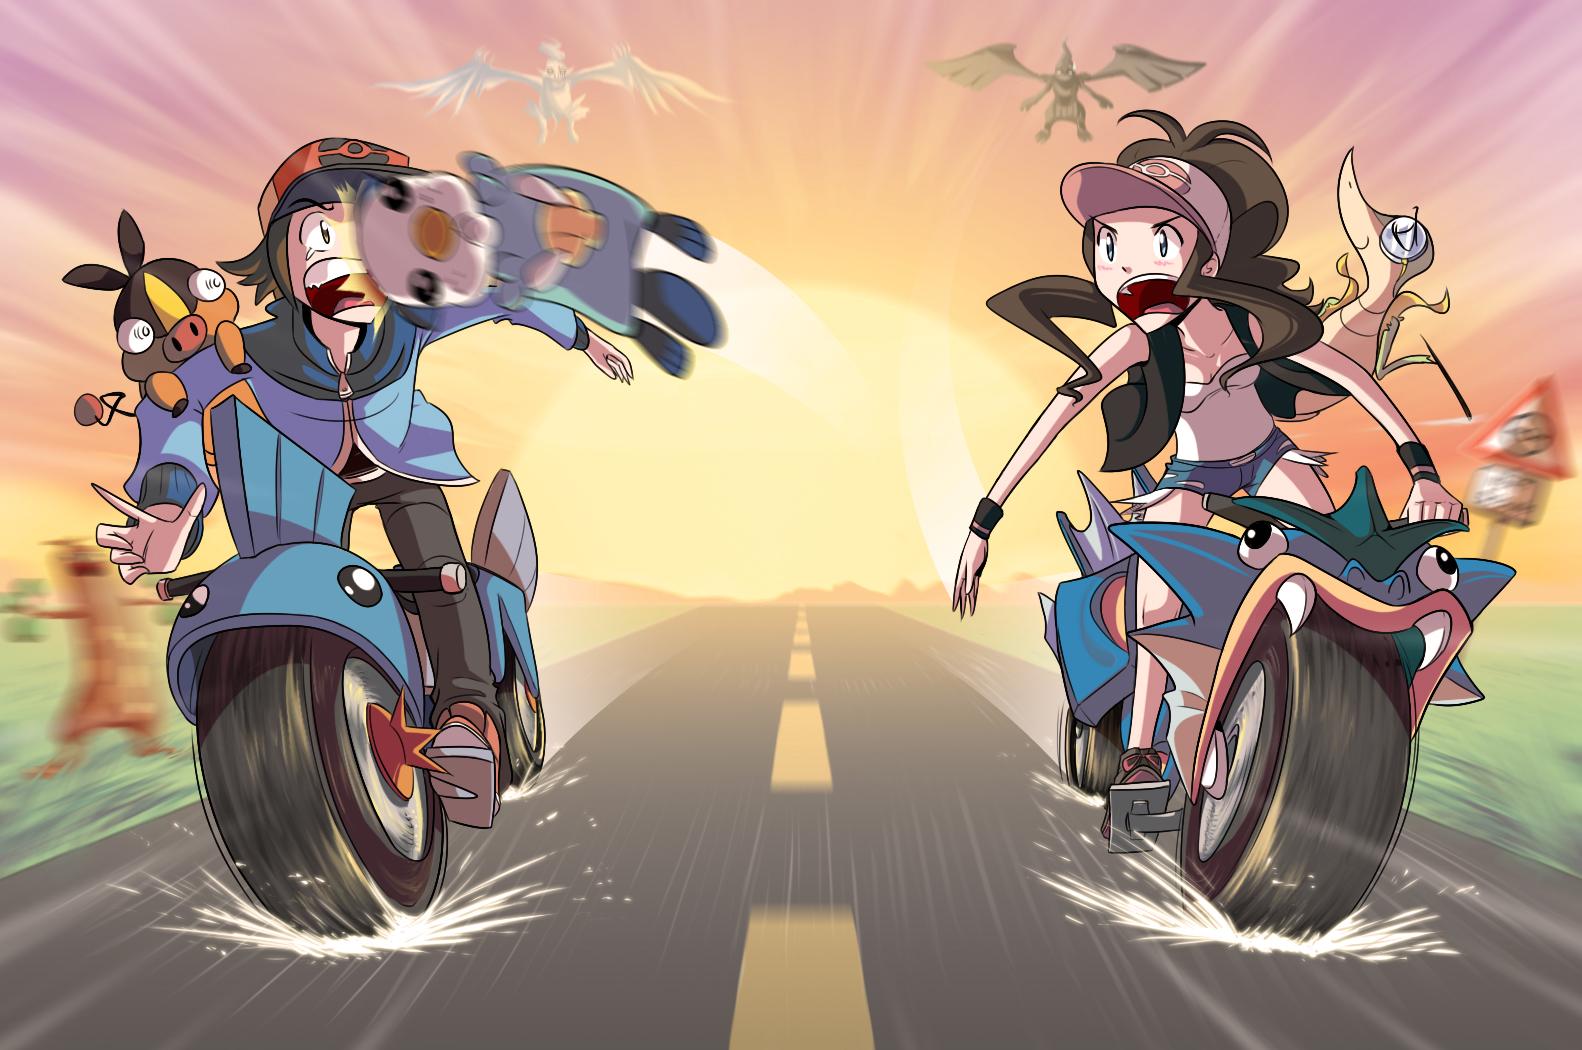 PKMN BATTLES ON MOTORCYCLES by Sir-Doomy